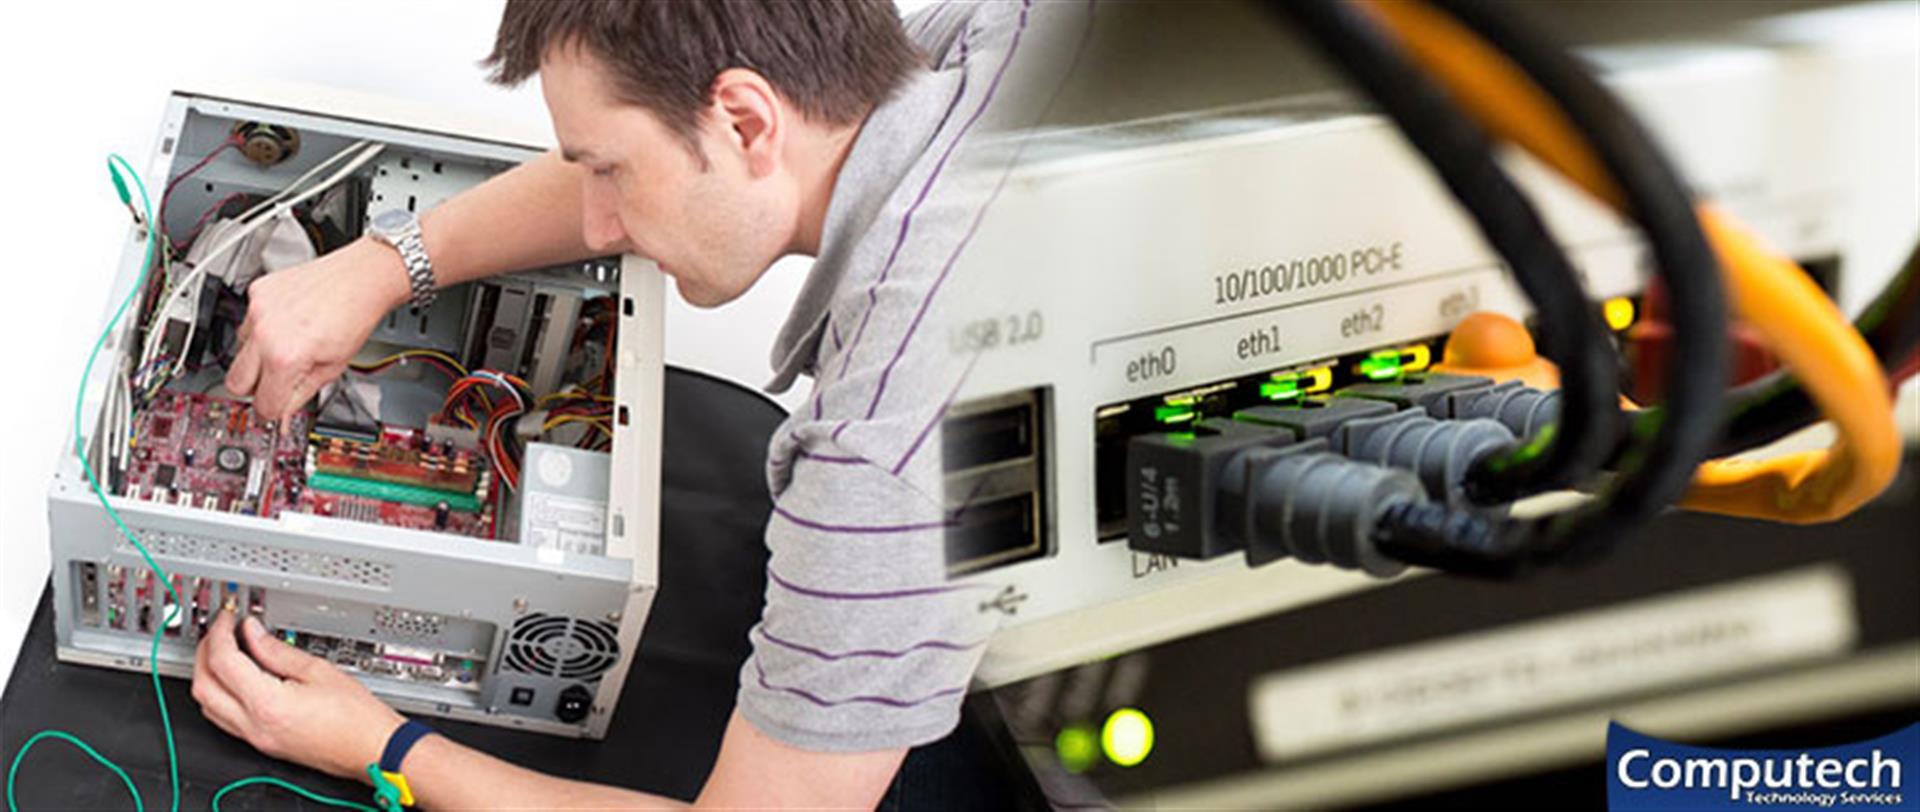 Blacksburg Virginia Onsite PC & Printer Repair, Networking, Voice & Data Cabling Services